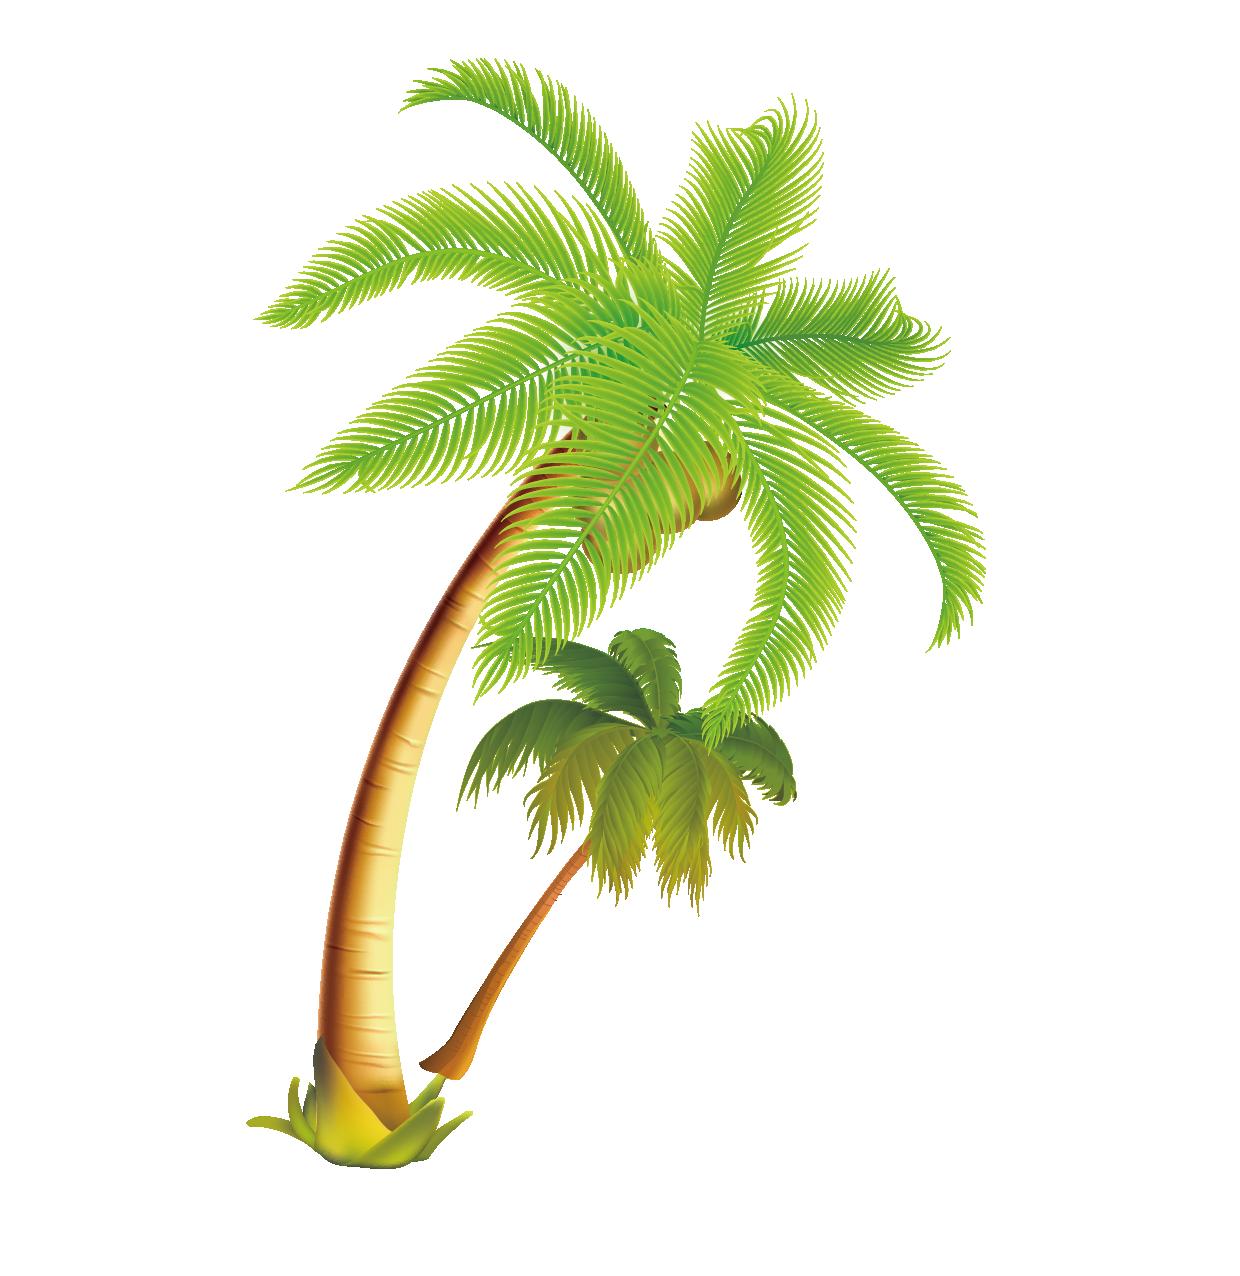 Coconut clipart tropical coconut. Arecaceae tree vector material